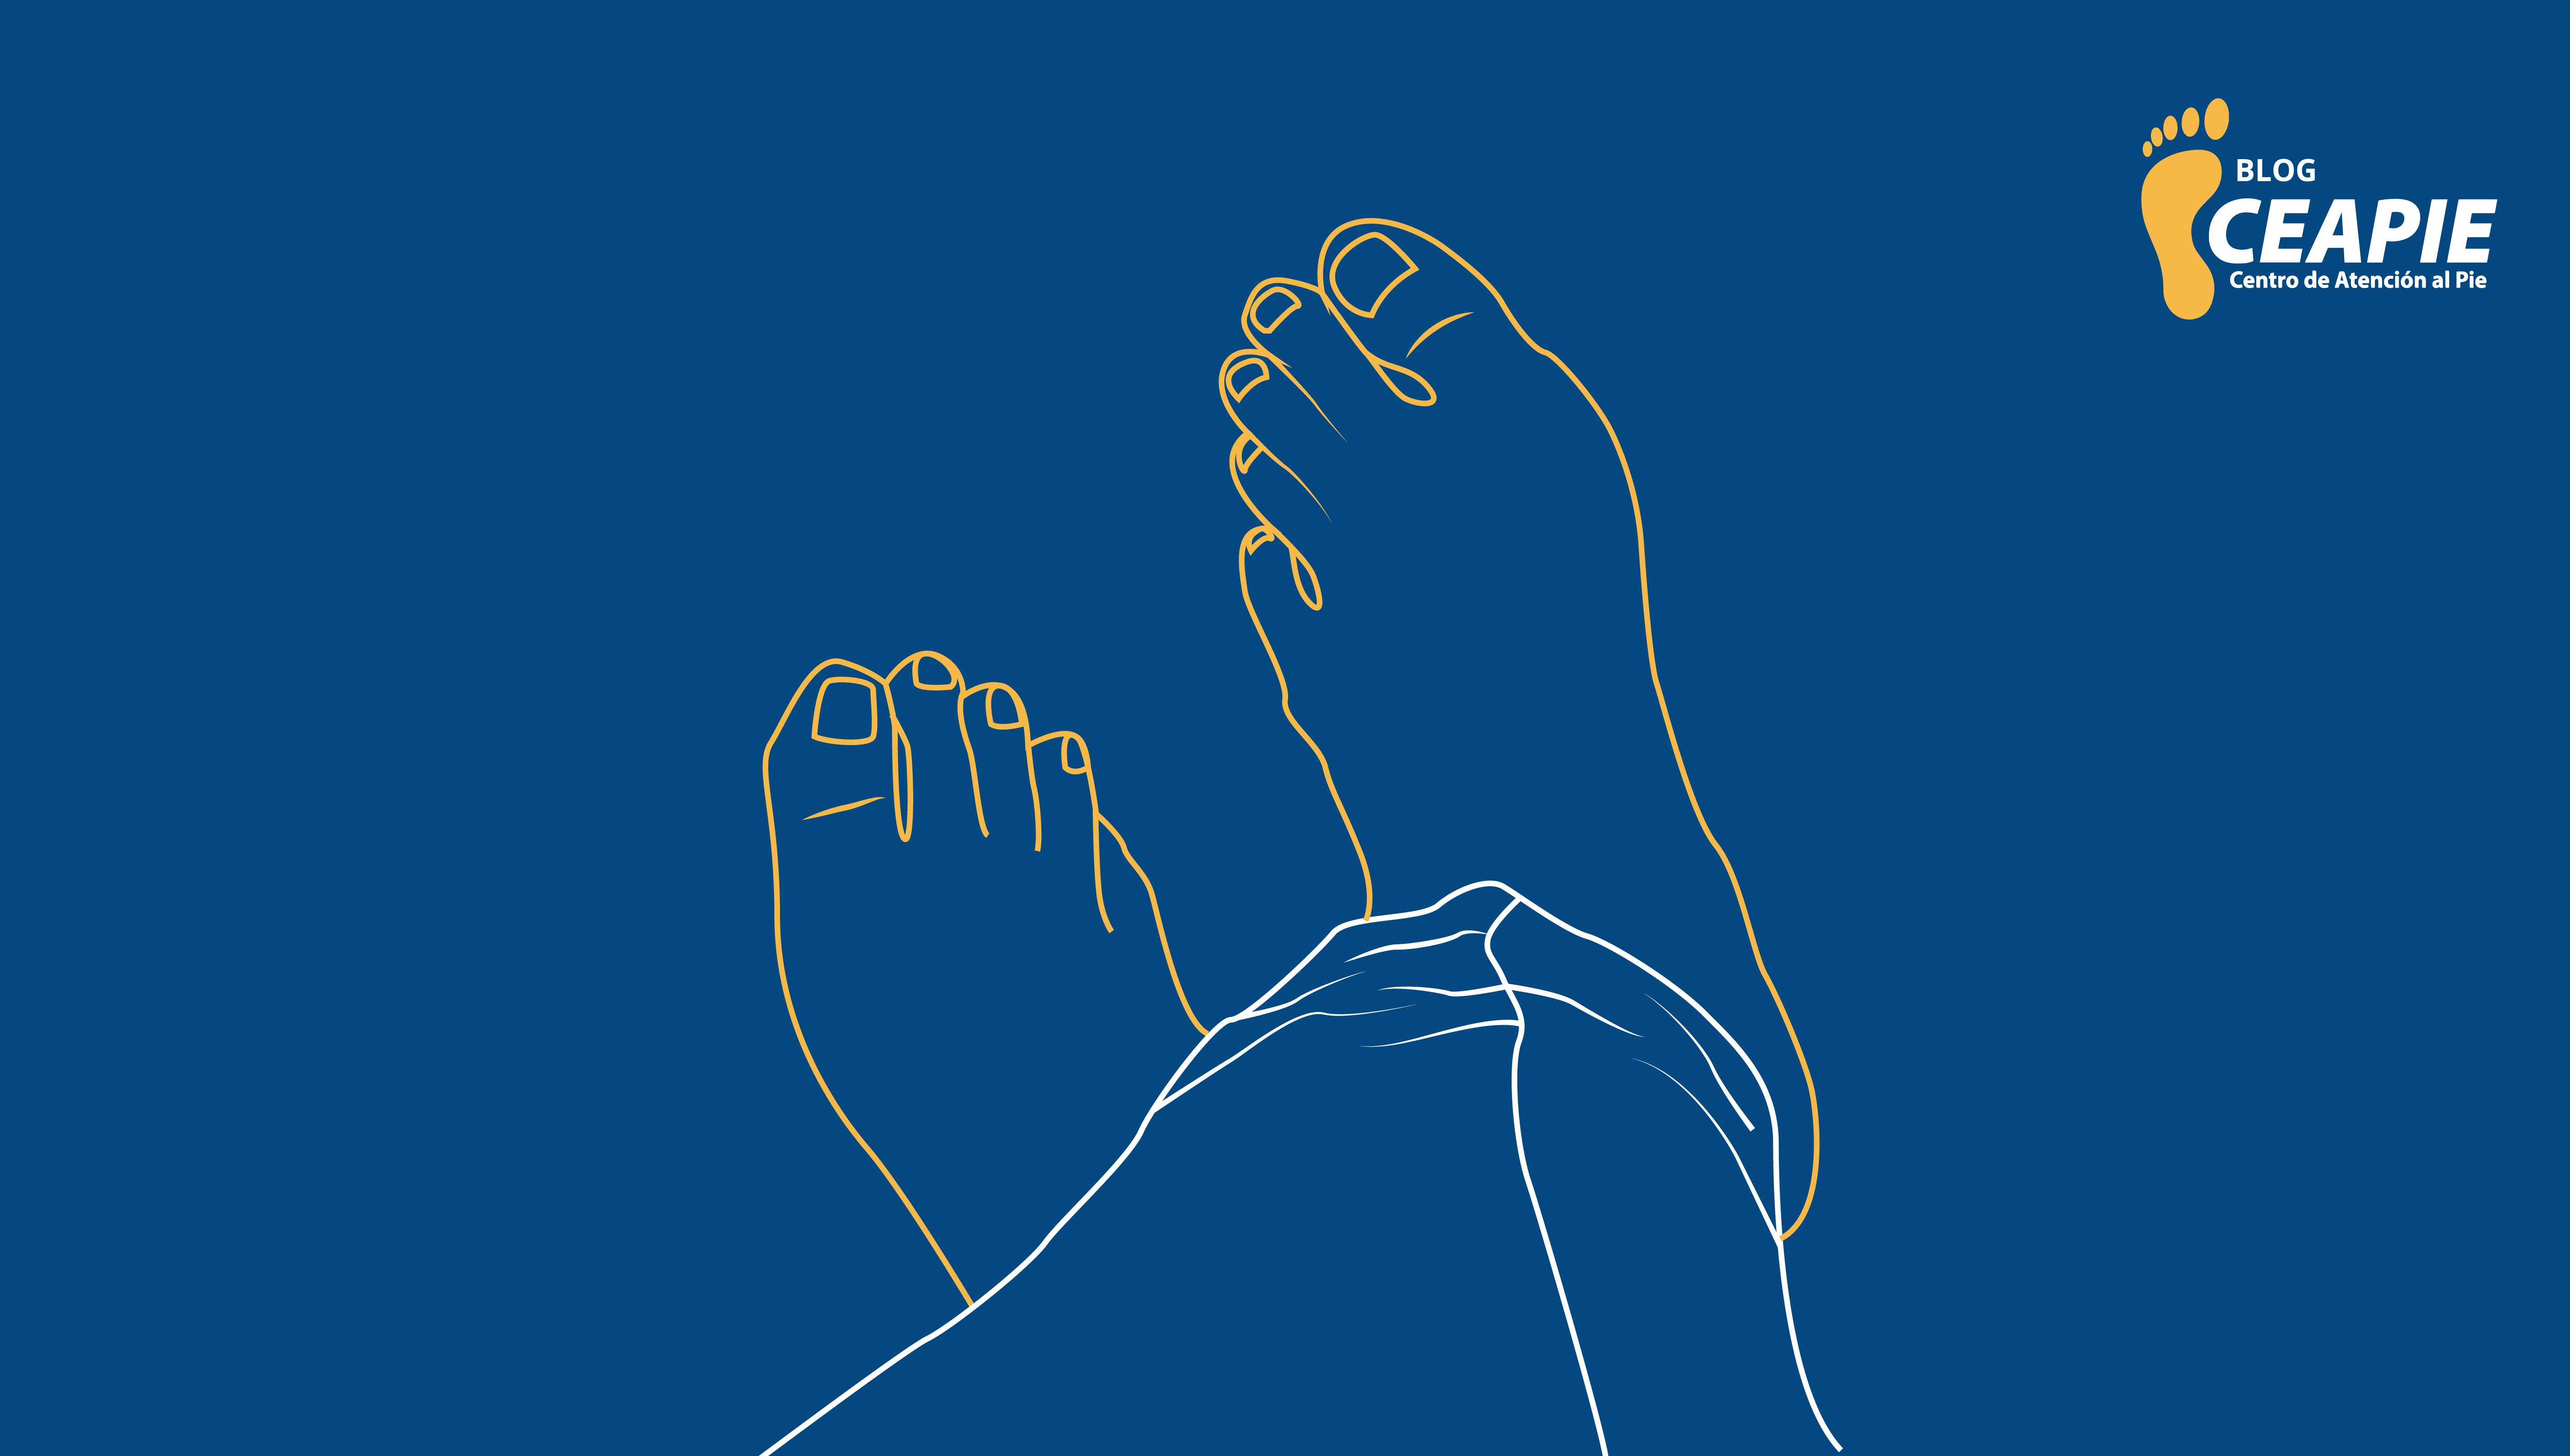 Blog-CEAPIE-artrosis-en-los-pies (2)